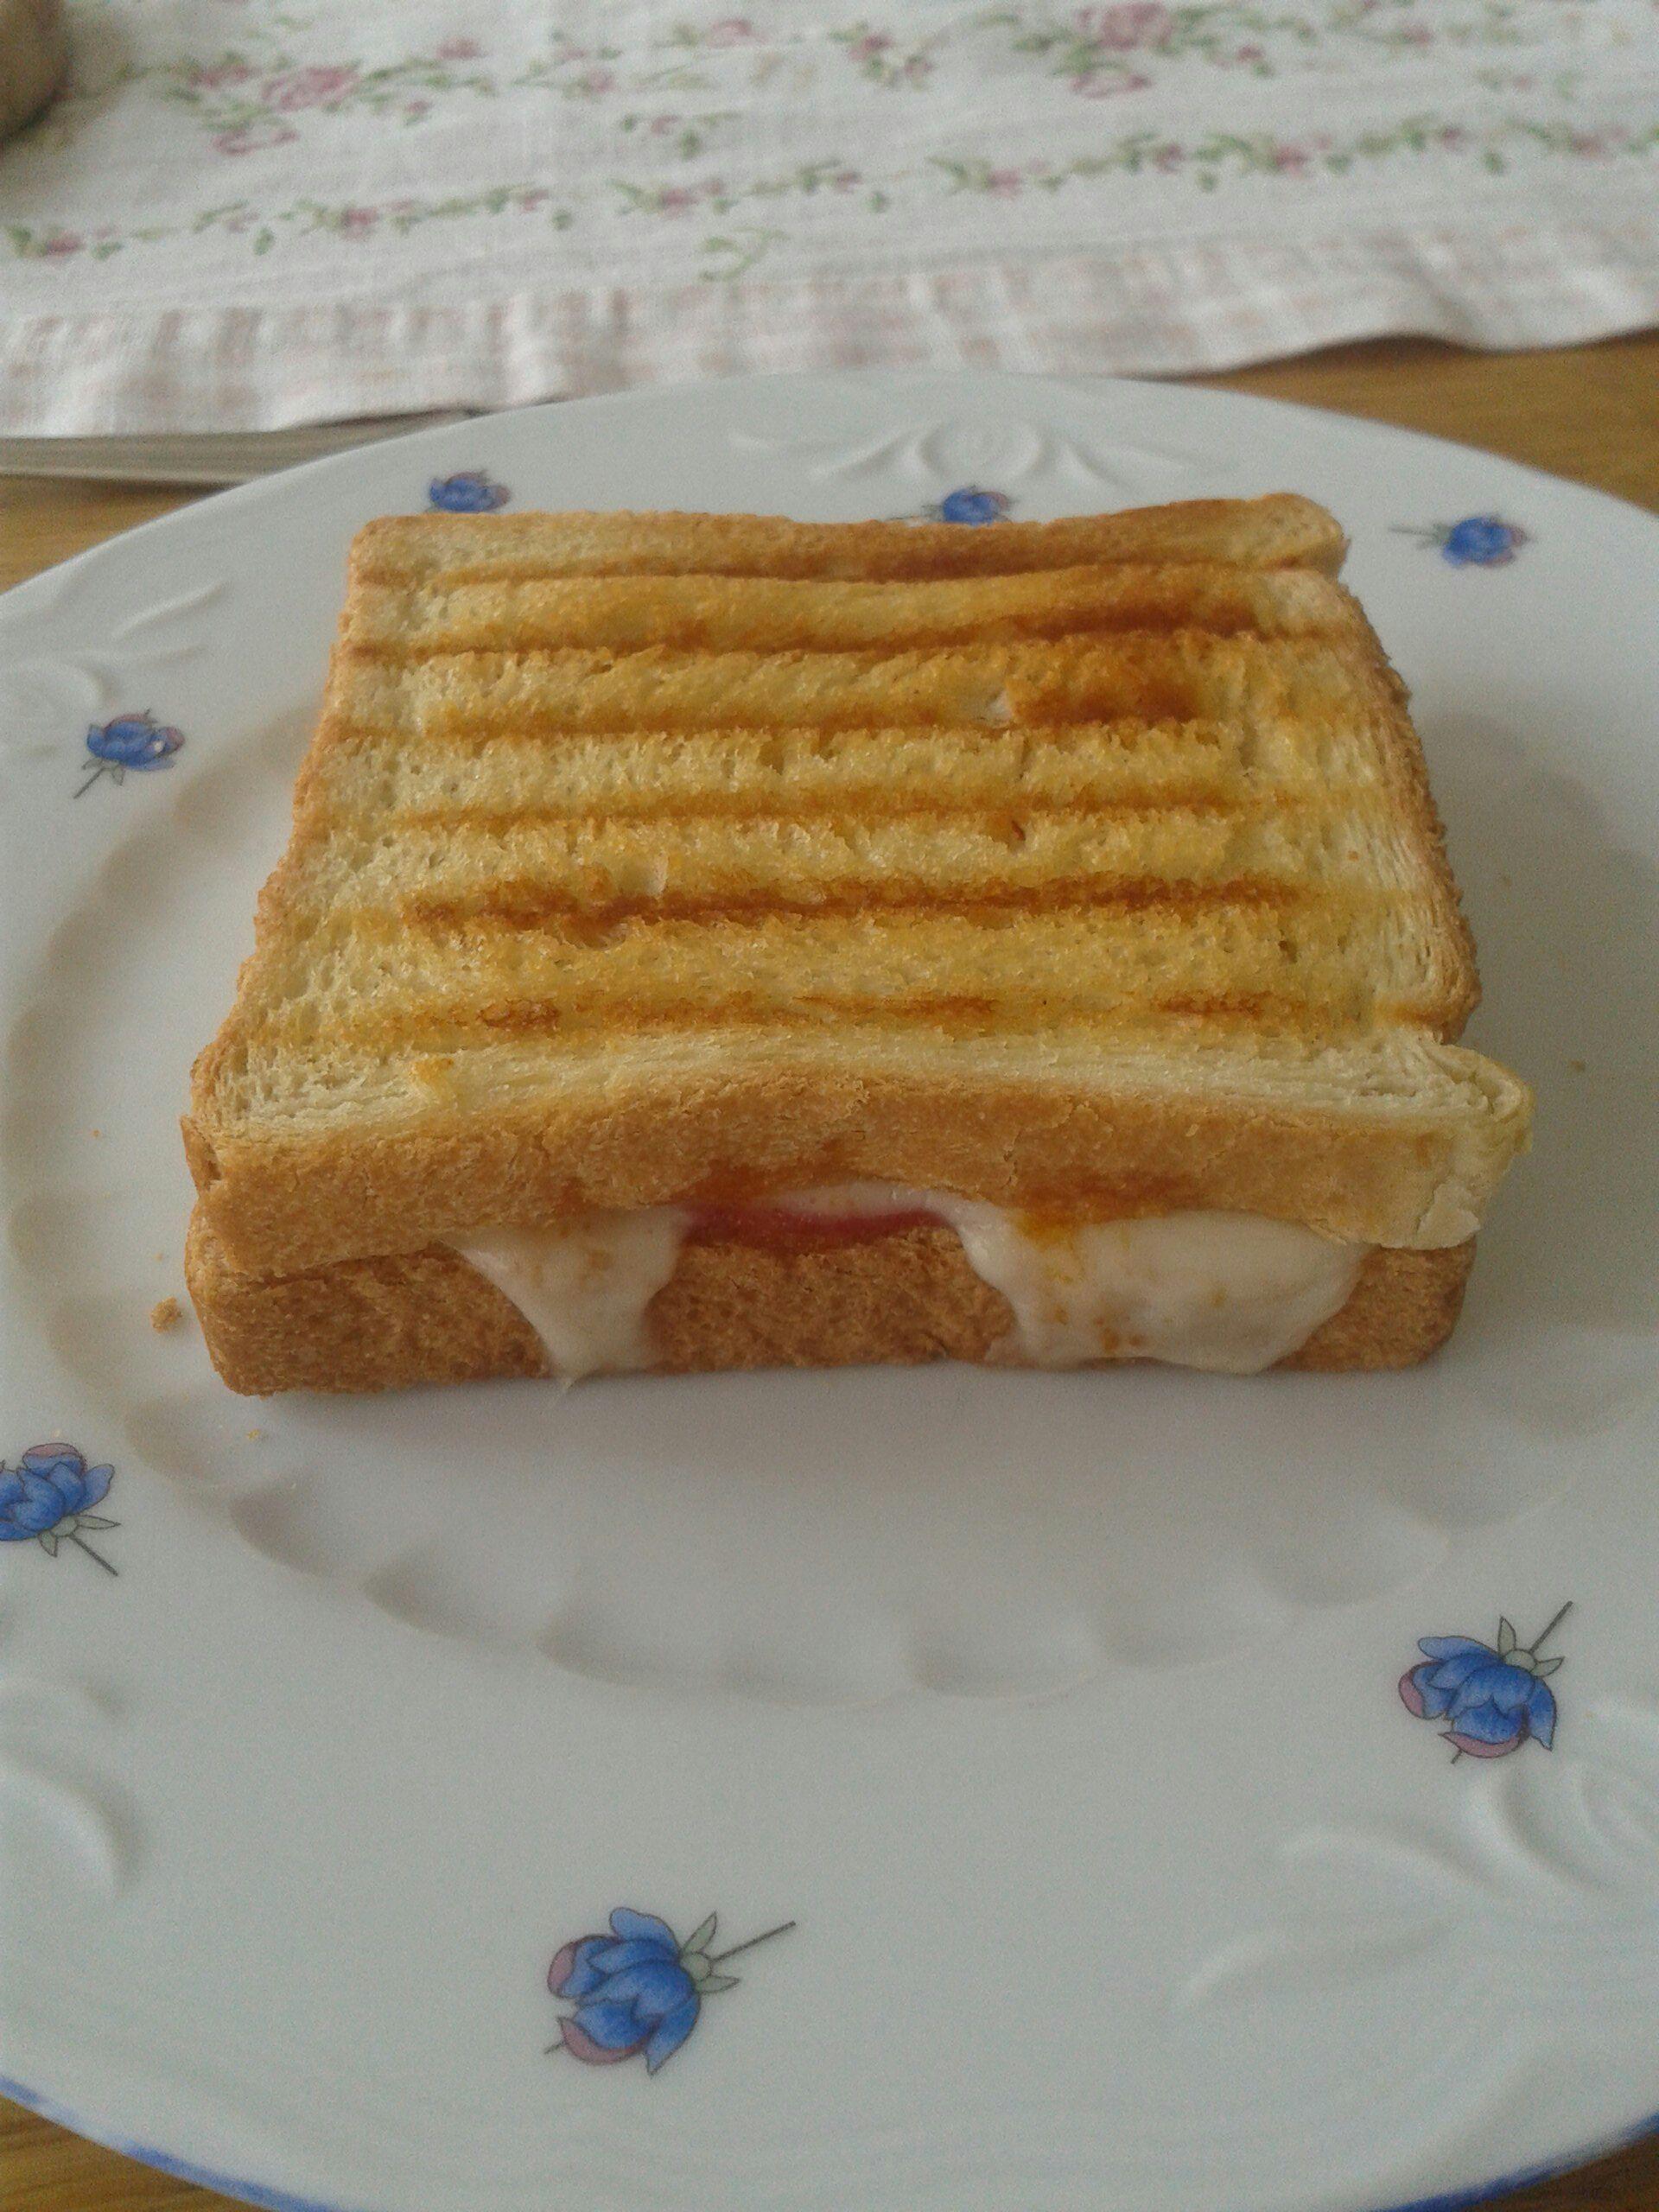 How to make a Toast Sandwich